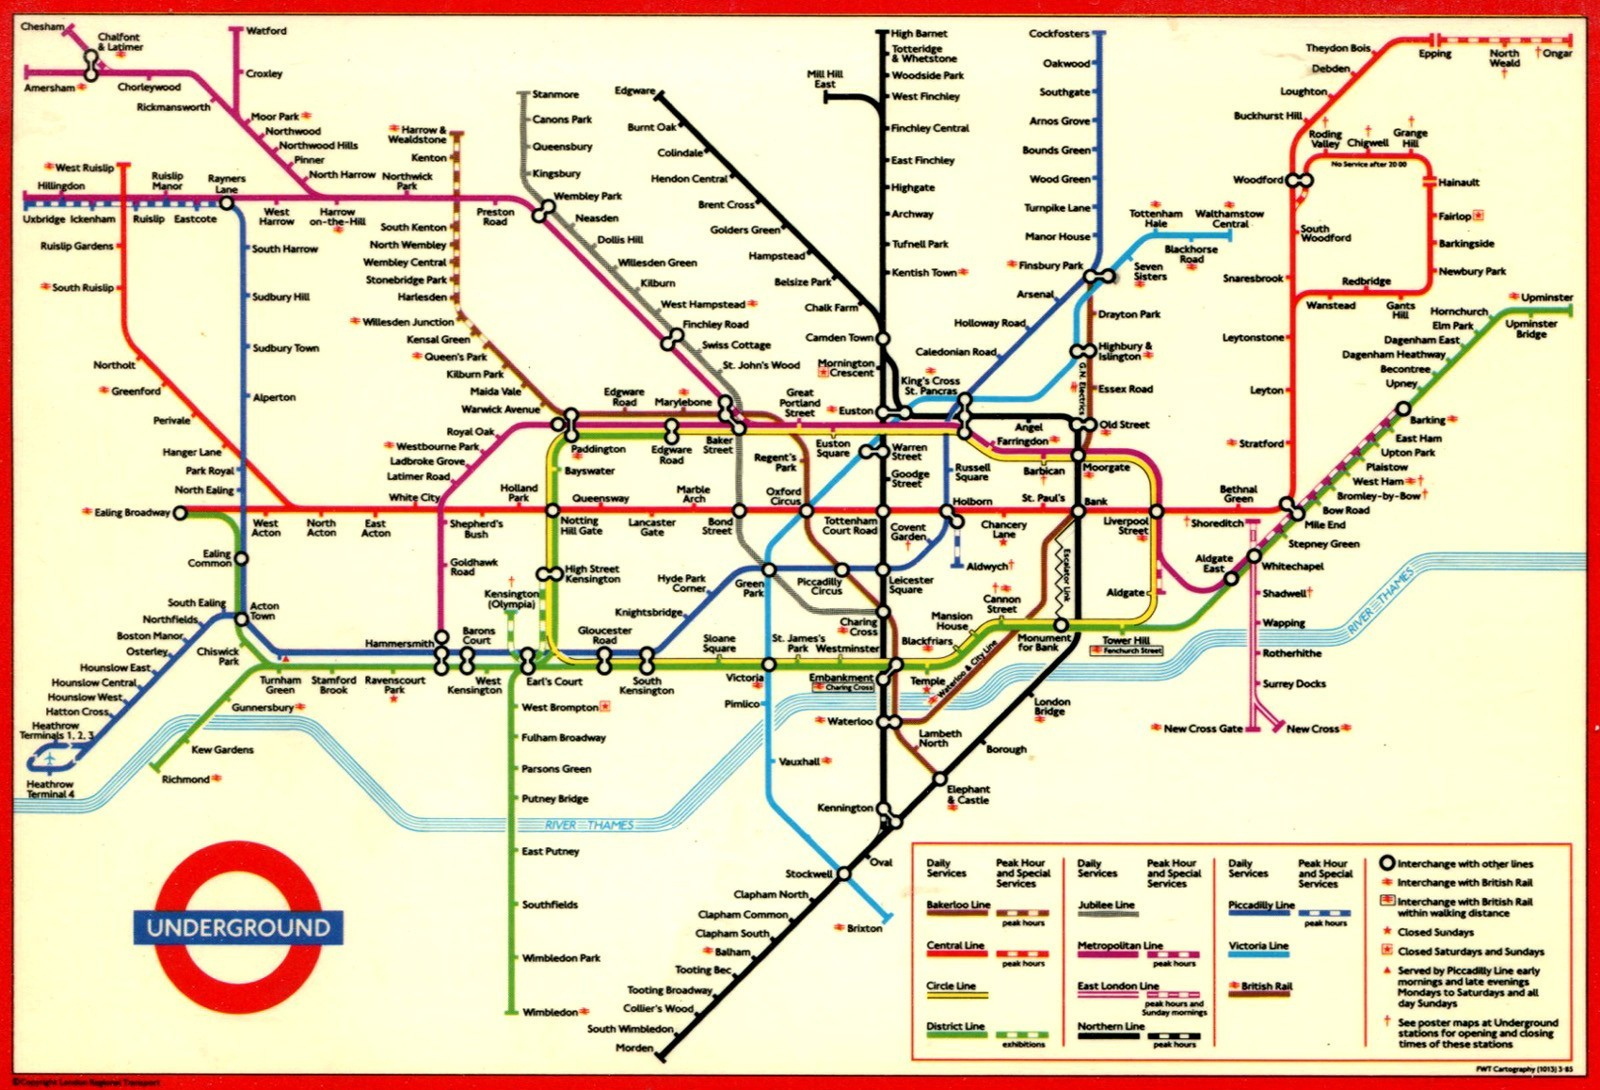 London Underground Map Printable | Globalsupportinitiative - London Tube Map Printable